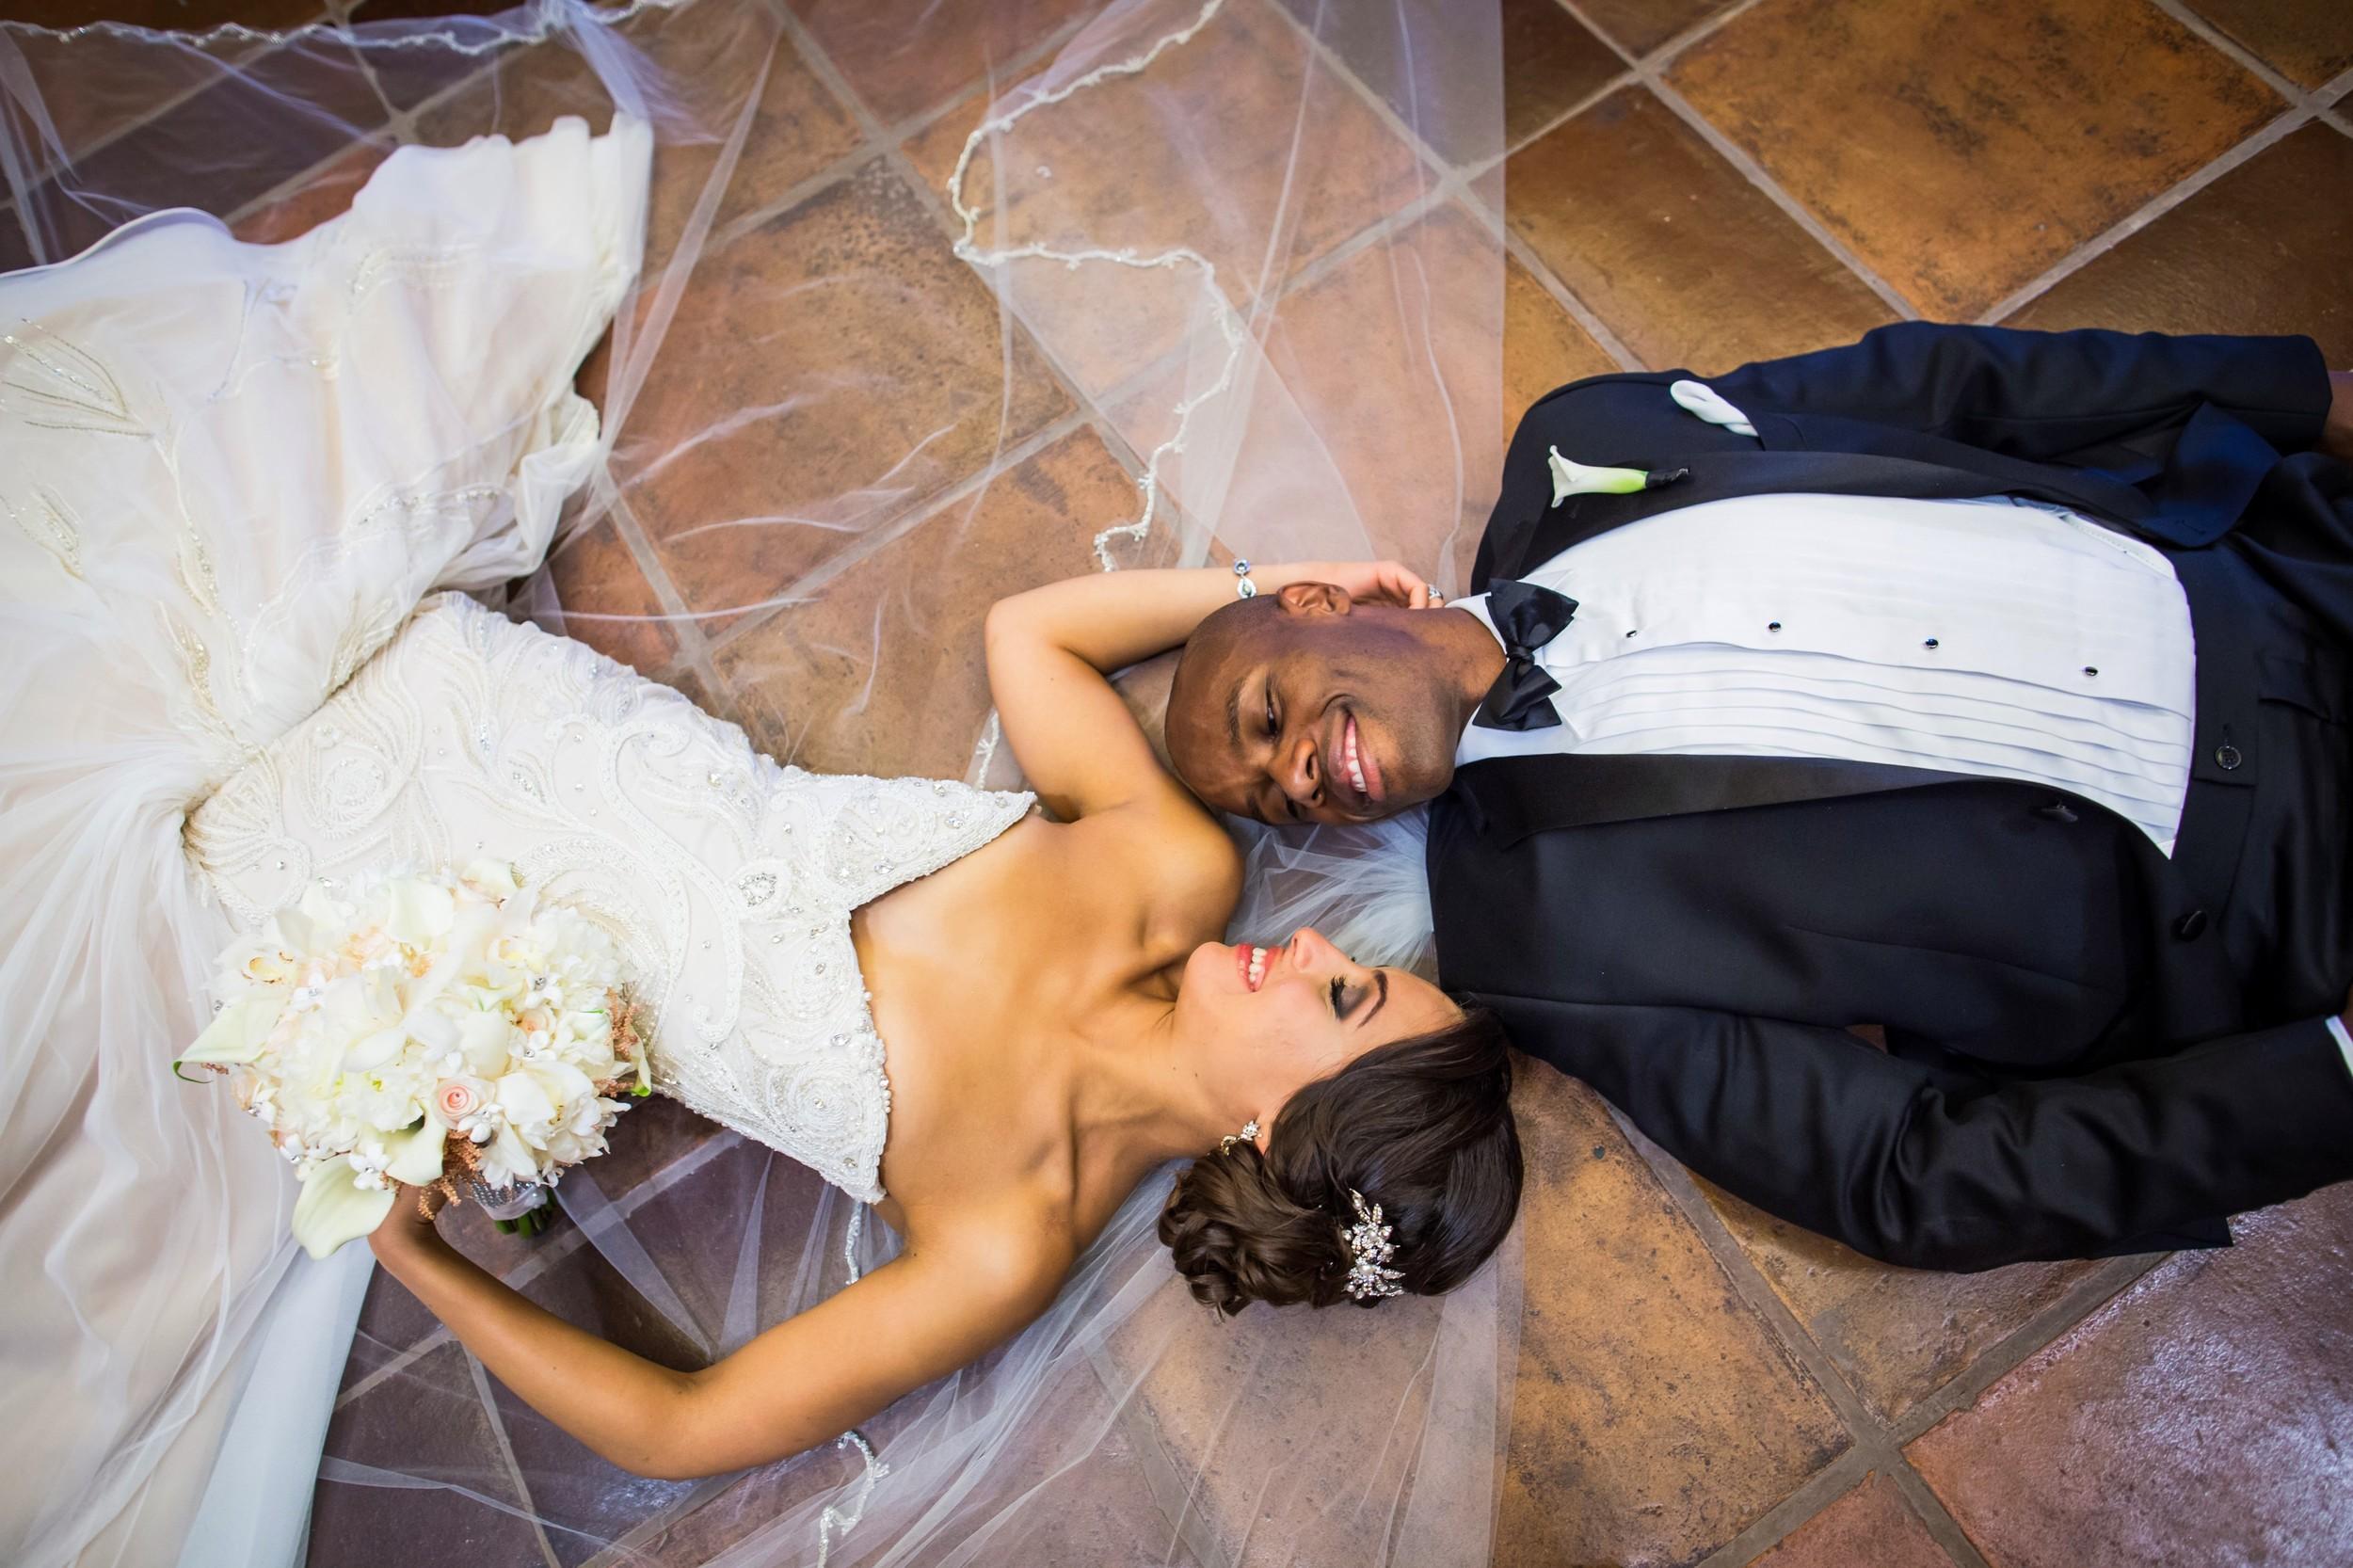 One of my favorite wedding photos!